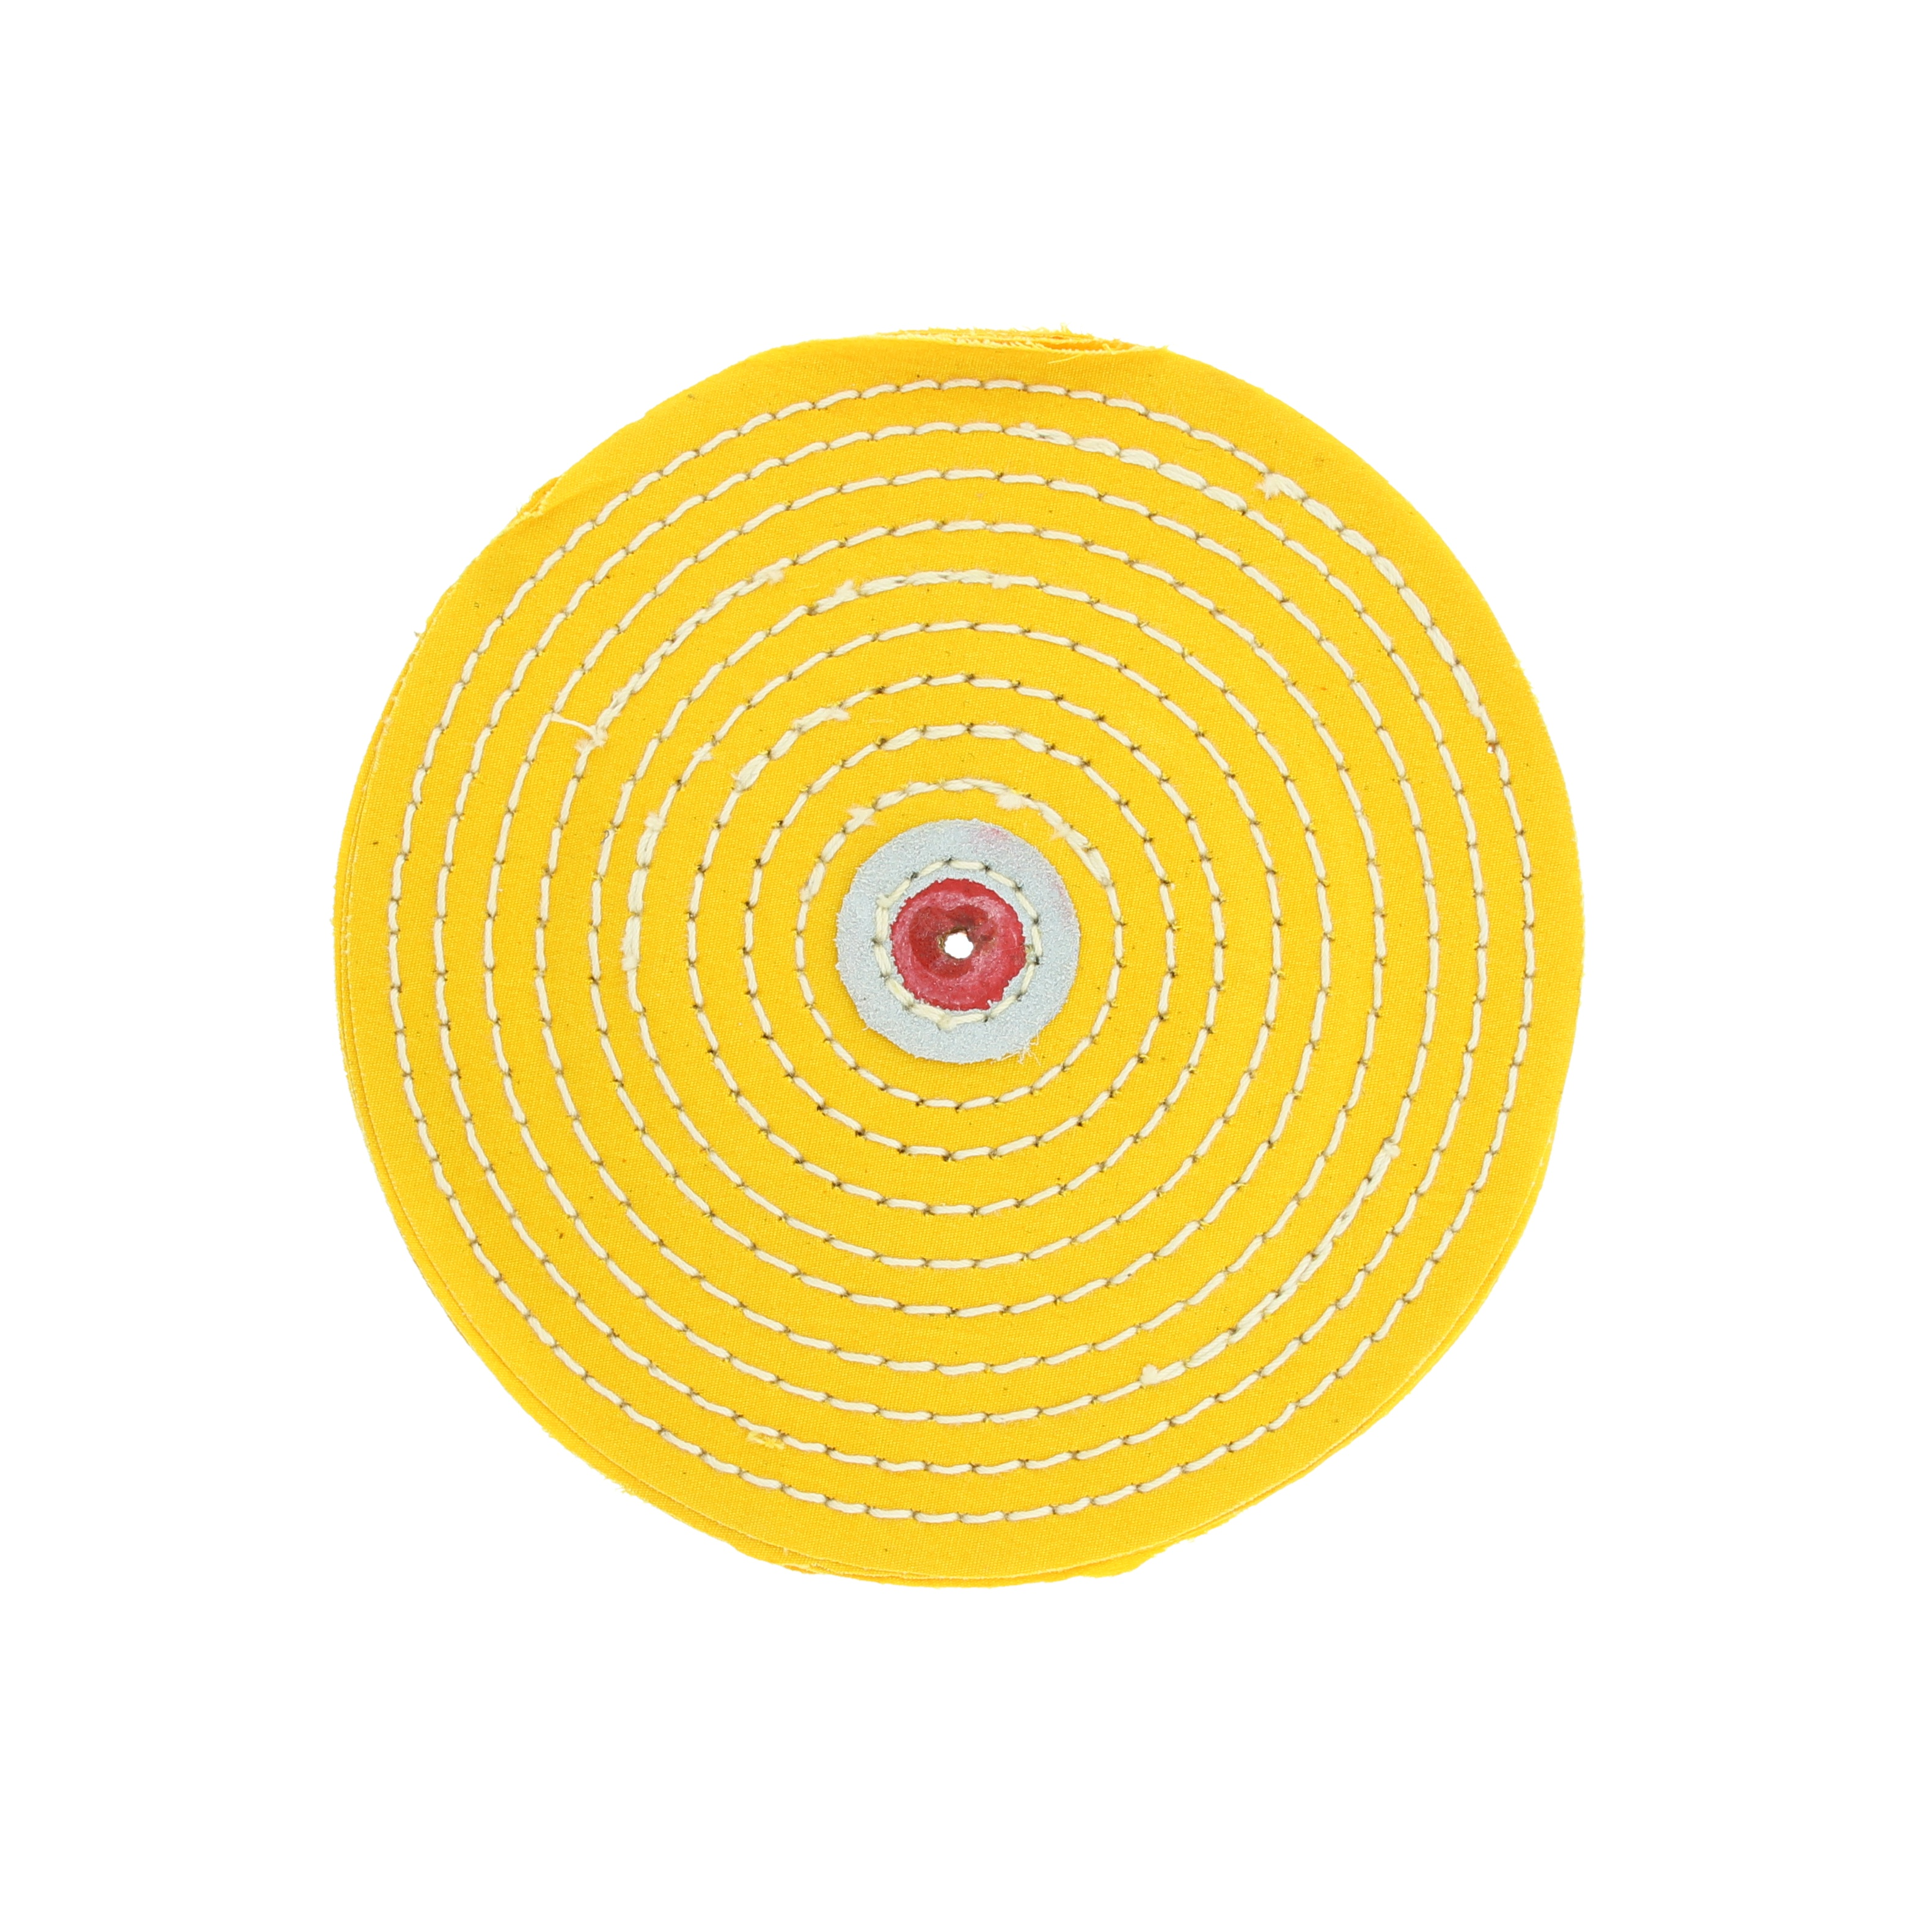 Круг муслиновый желтый чечевица 6х12